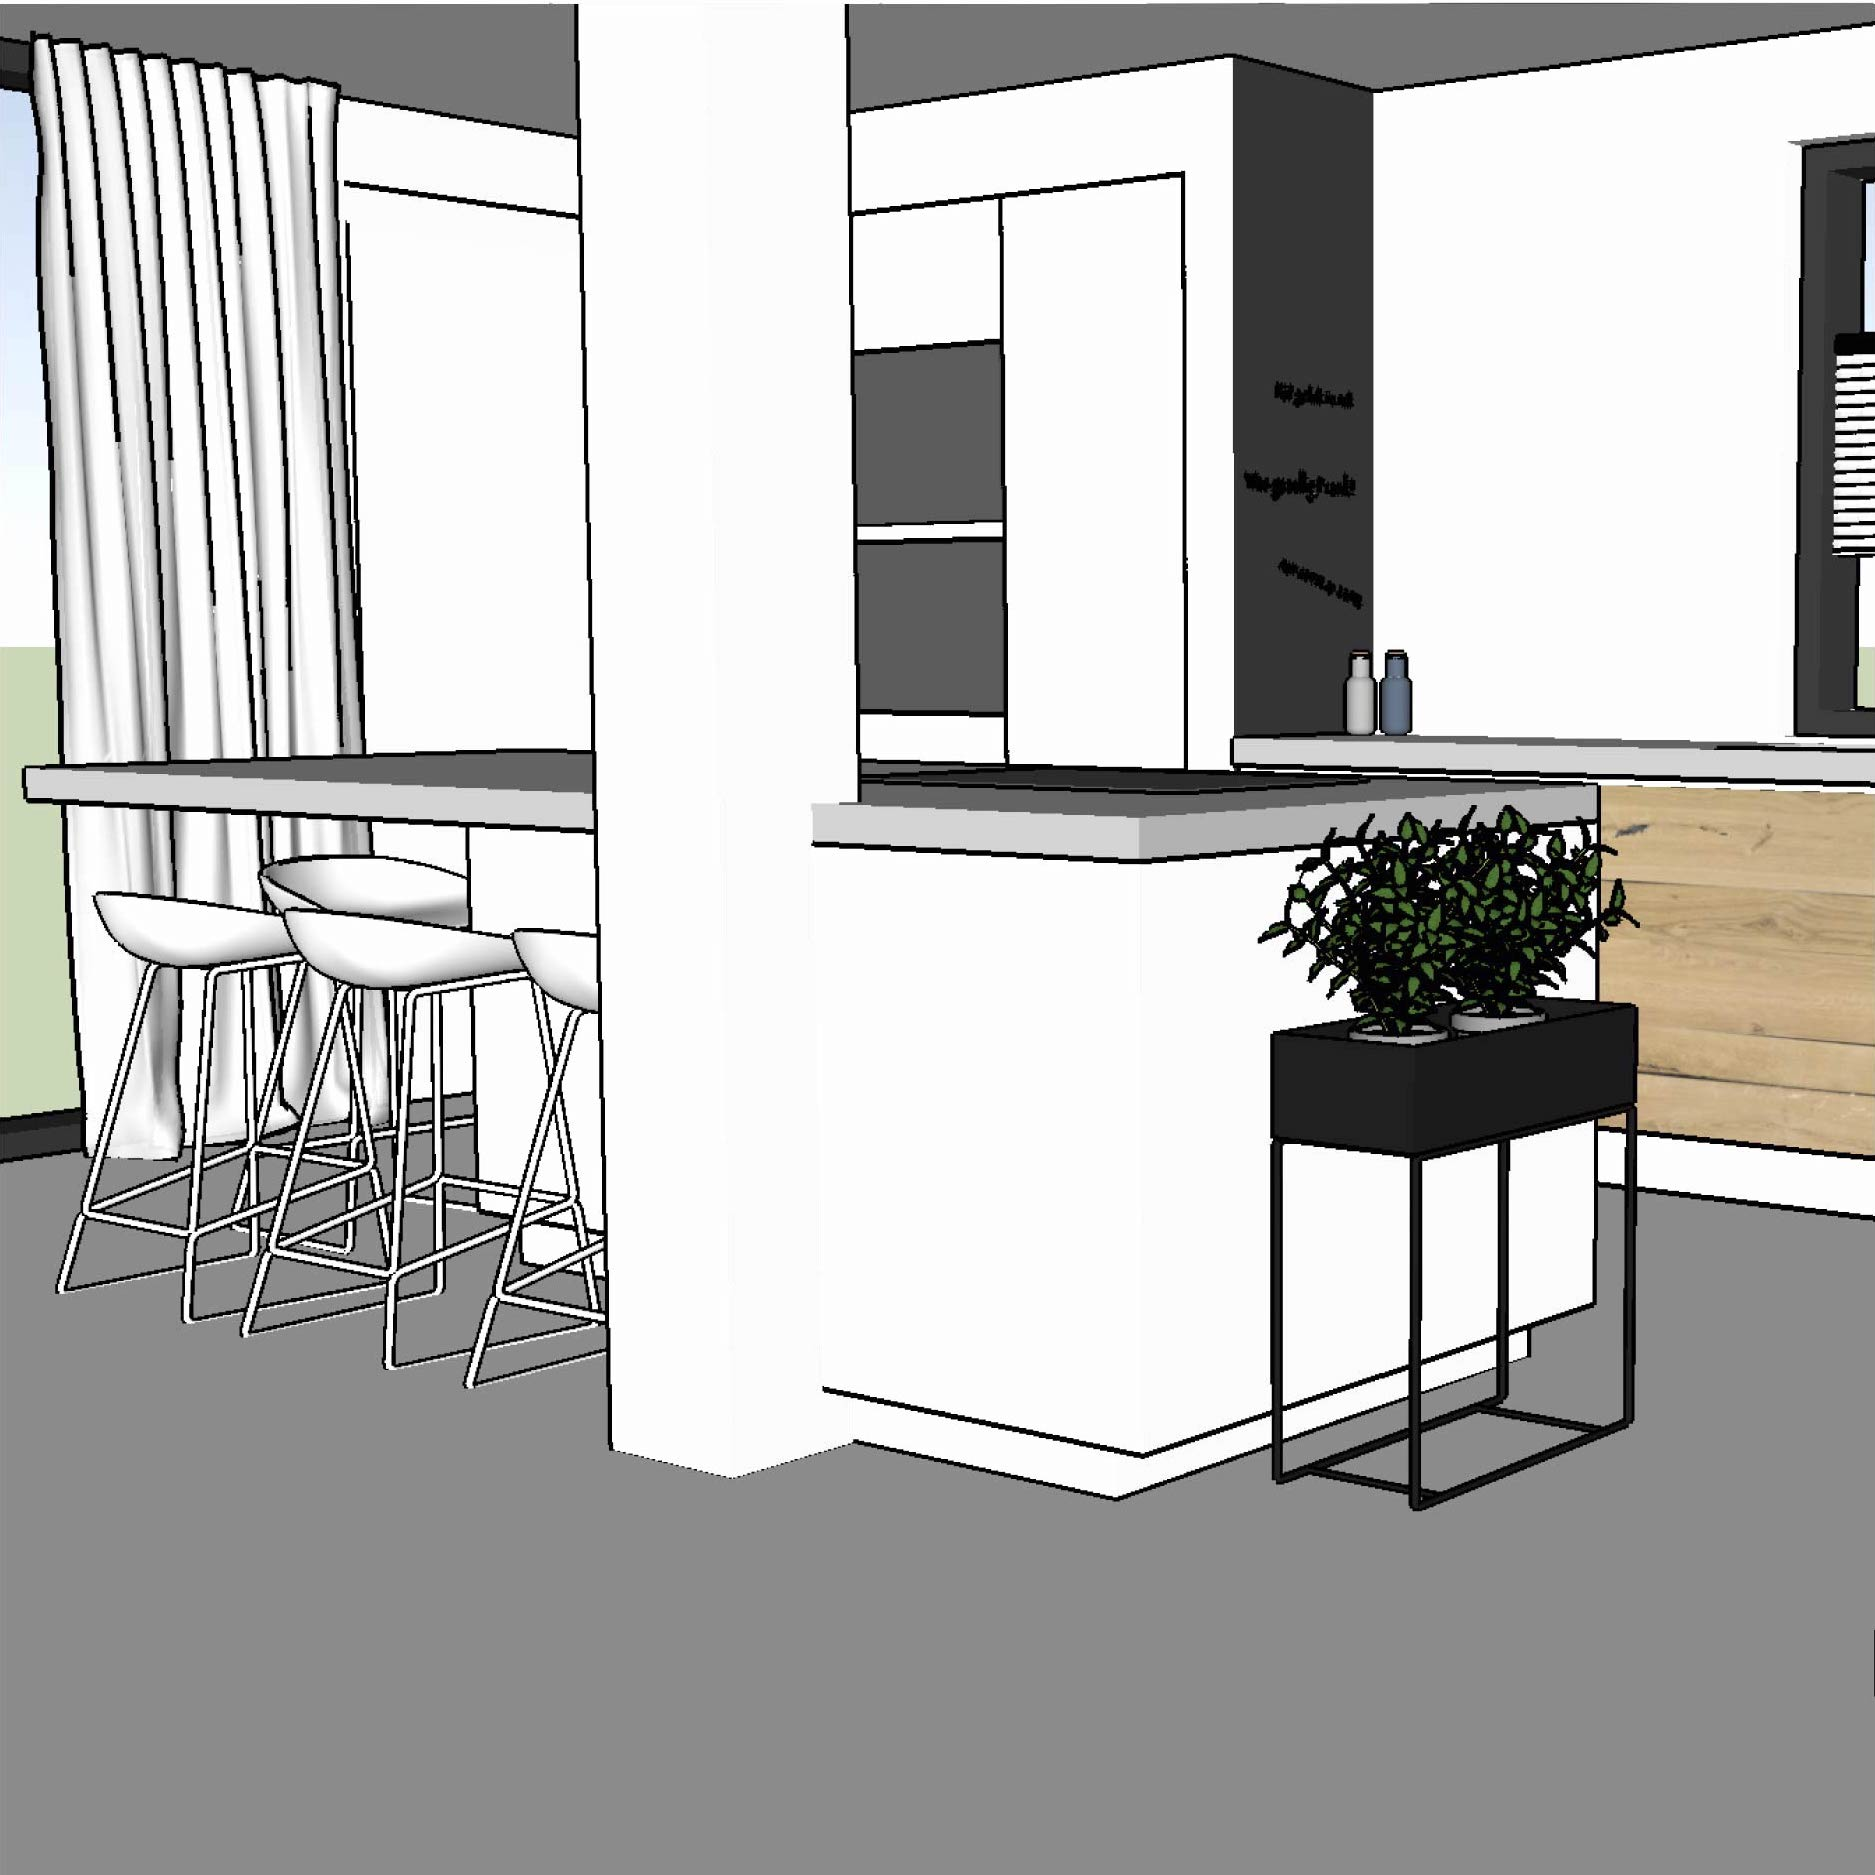 HUISMERCK-3D-ontwerp-interieurontwerp-project-modern-ruimtelijk-industrieel.jpg